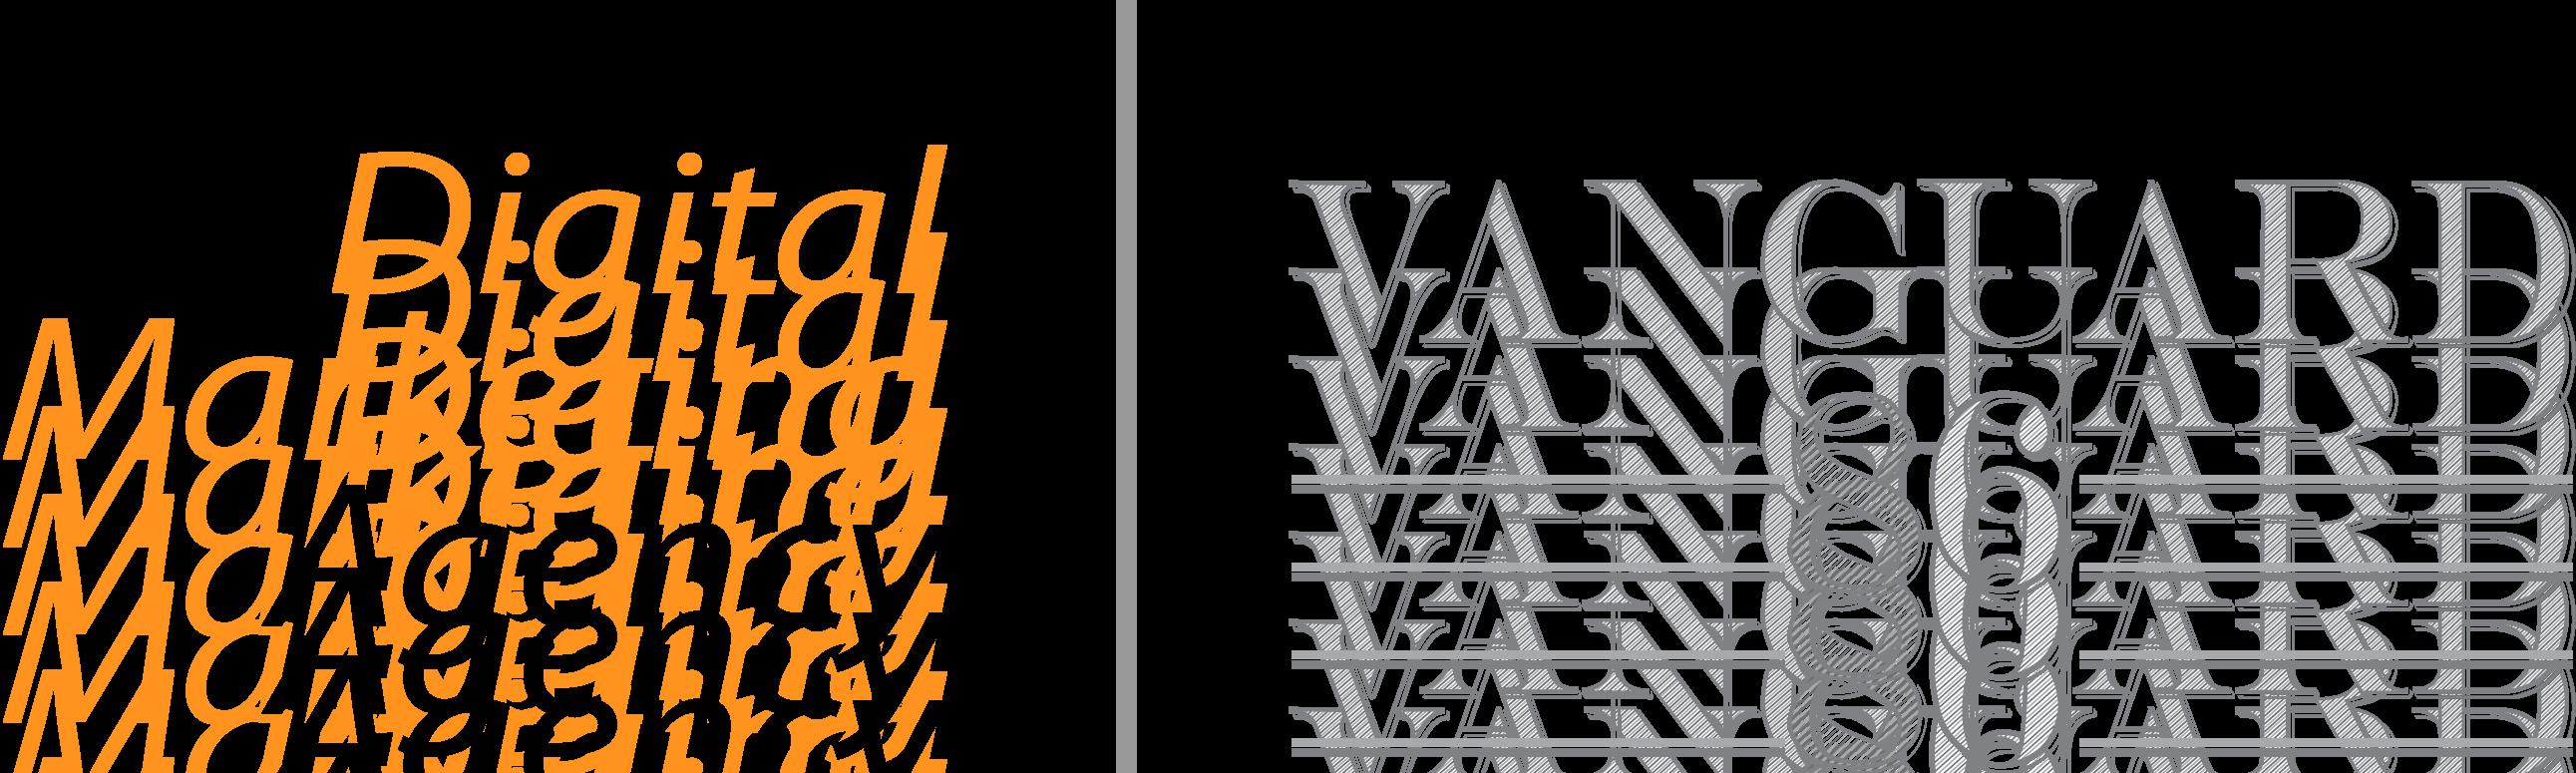 Vanguard 86 logo